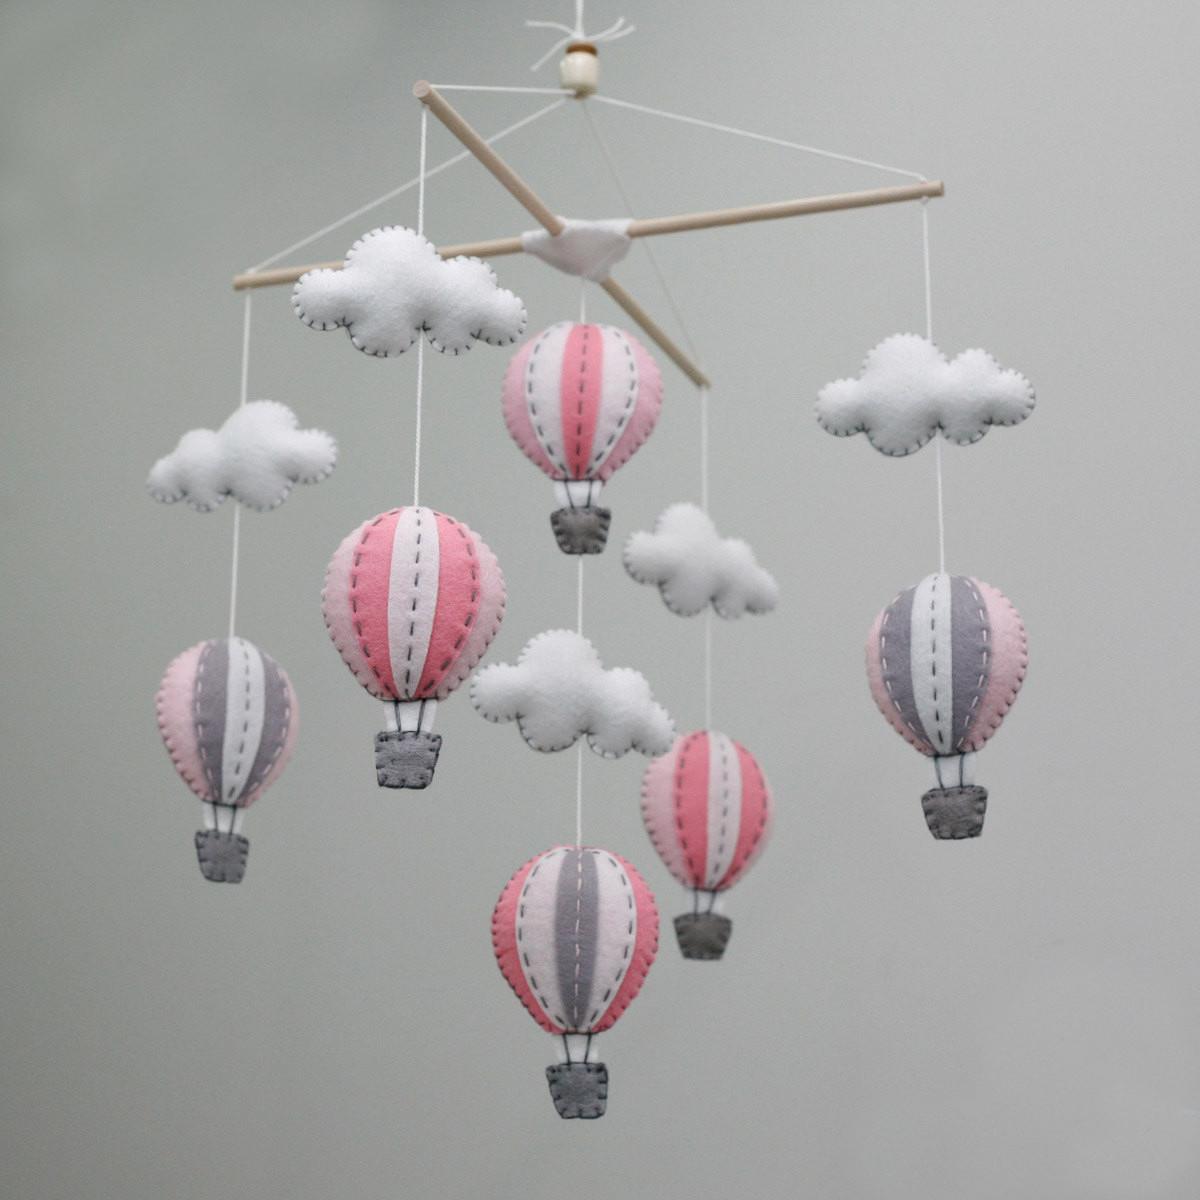 DIY Baby Mobile Kits  Cheap Hot Air Balloons Girl Baby Mobile DIY Kit Pink for